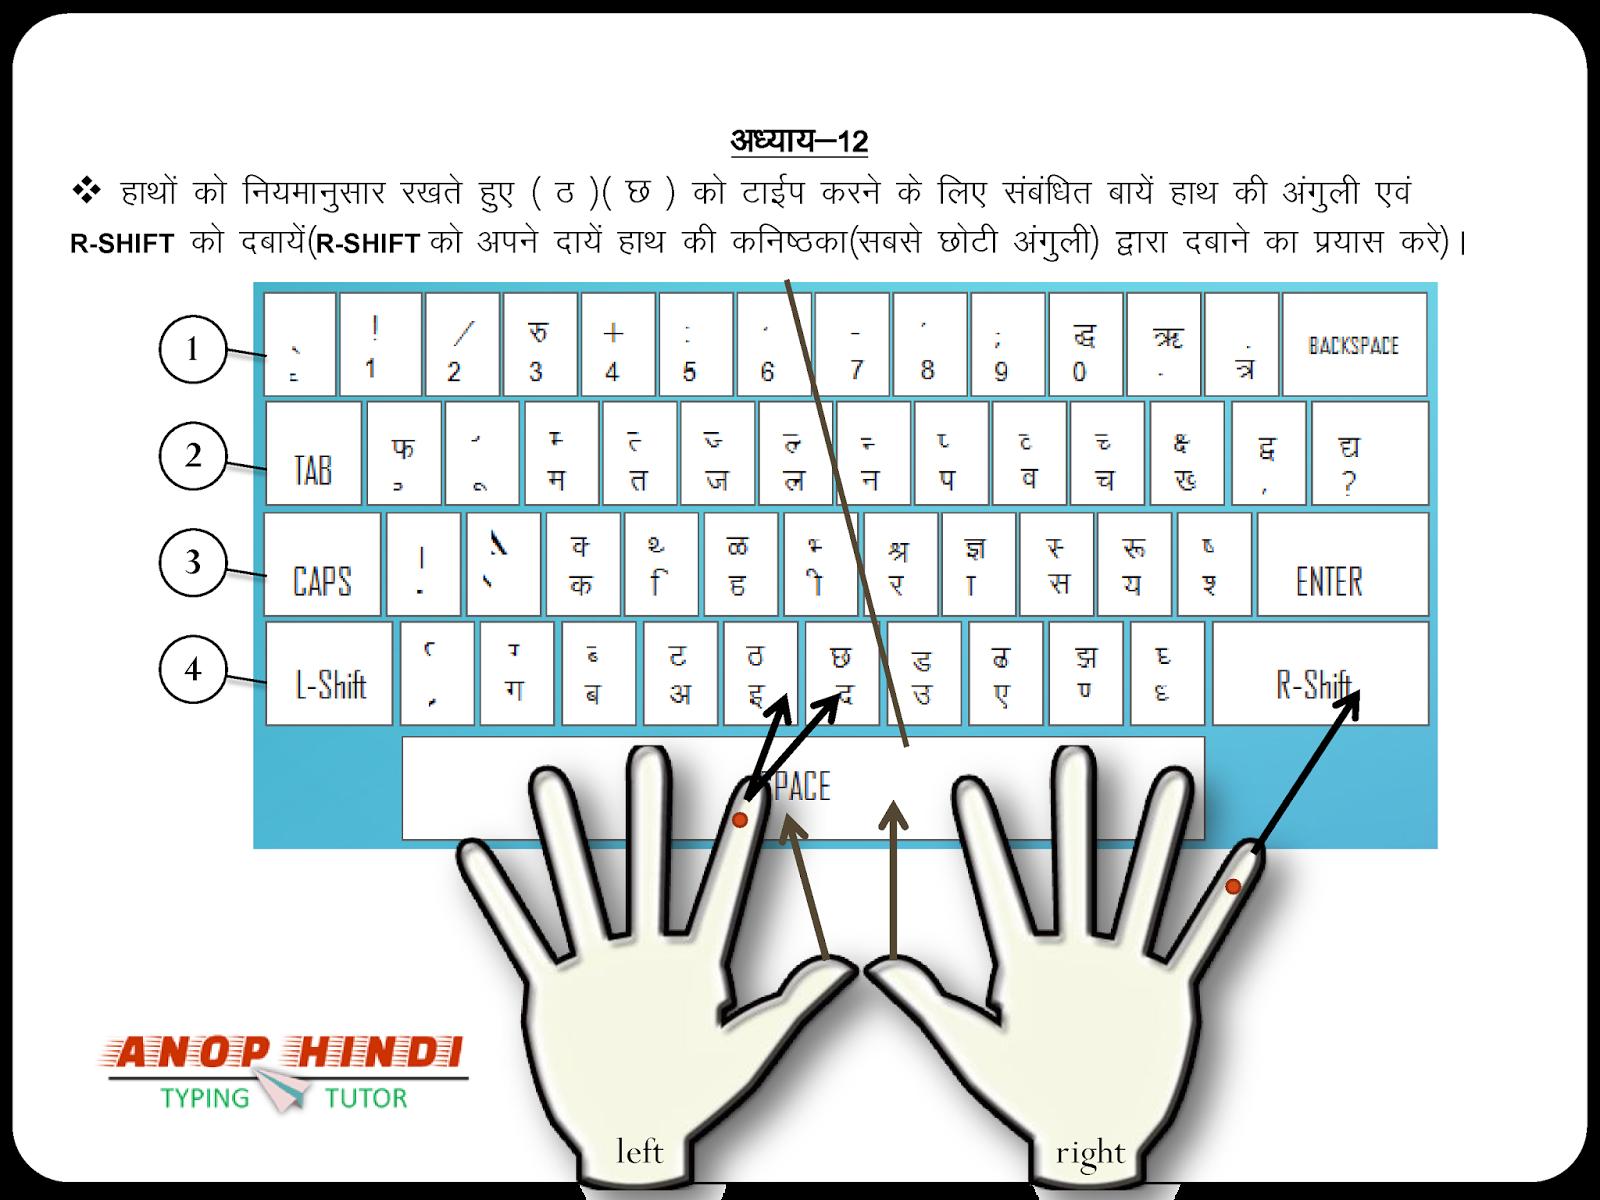 Anop Hindi Typing Tutor - Lesson 12